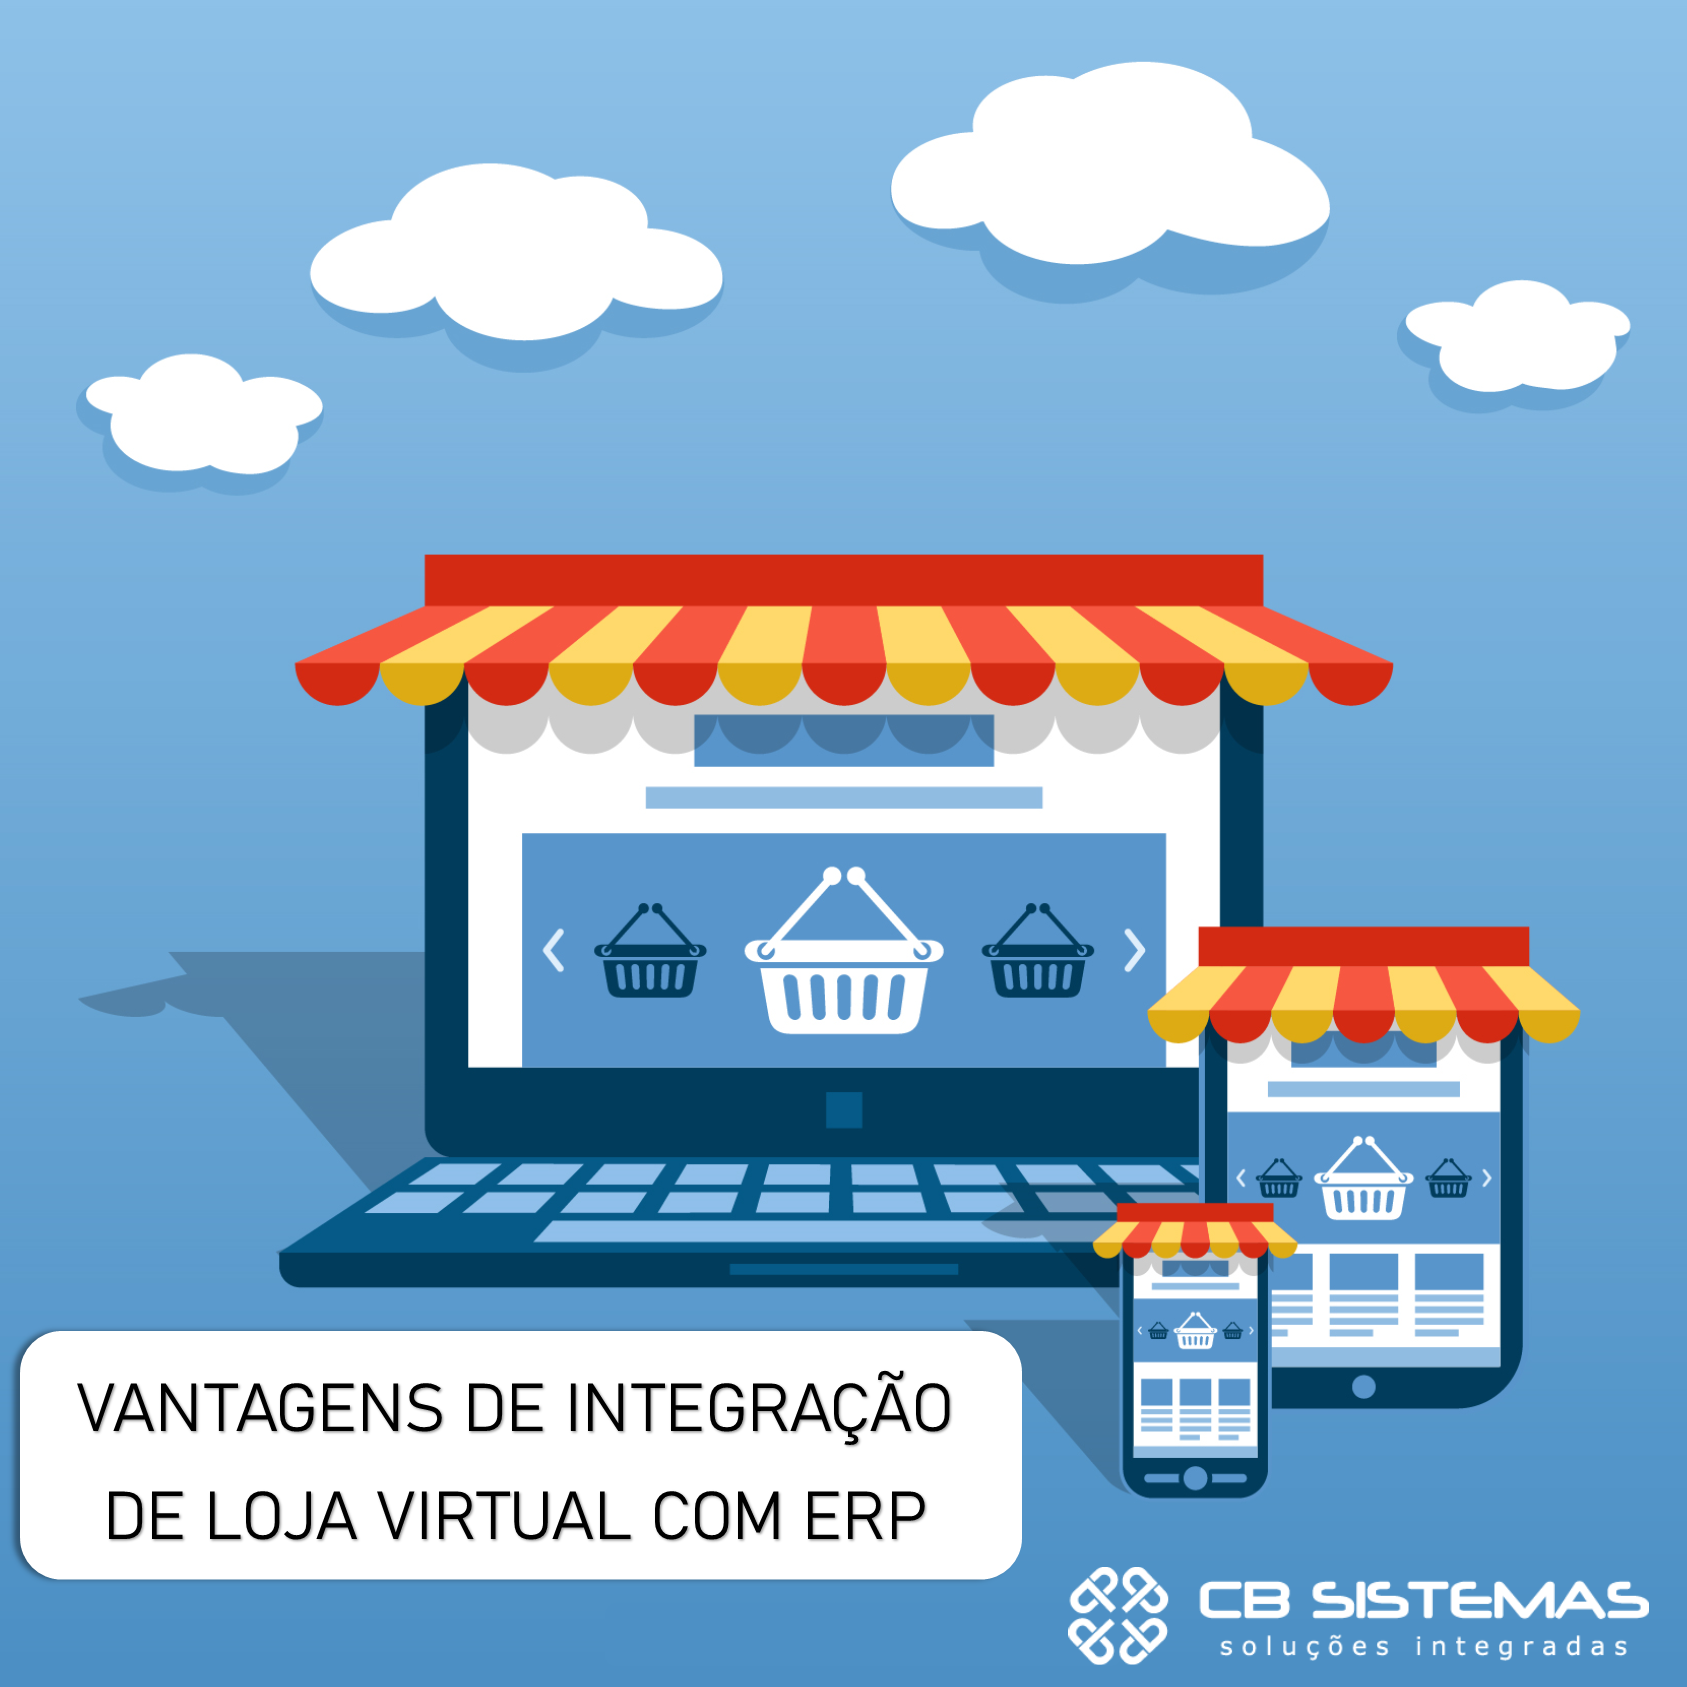 5 vantagens de loja virtual integrada com ERP